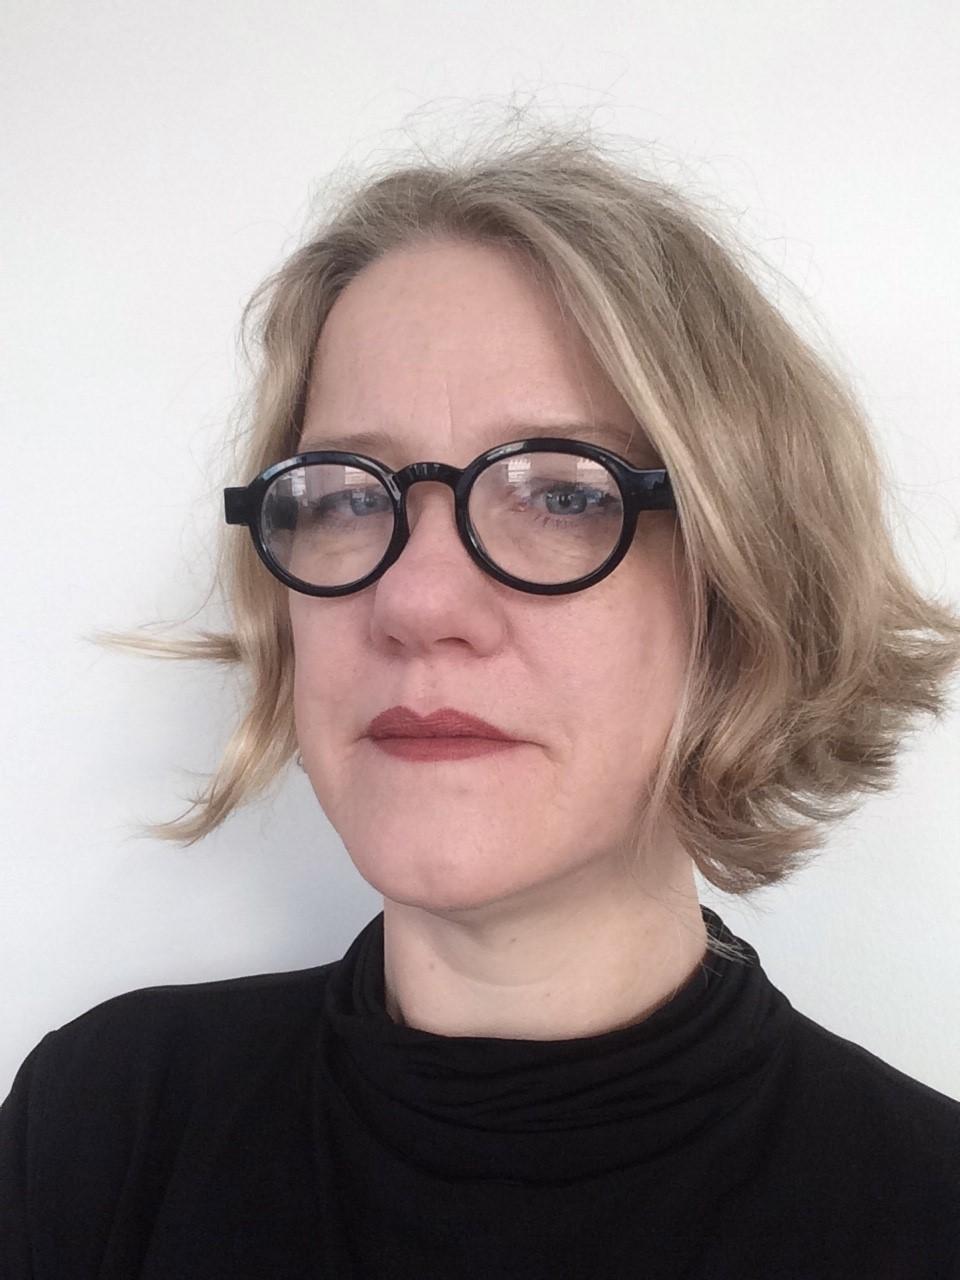 Anna Wemmert Clausen arbetar som frilansande ljusdesigner. Hon har arbetat i branschen sedan 1992 då hon fick sin examen i teaterteknik.